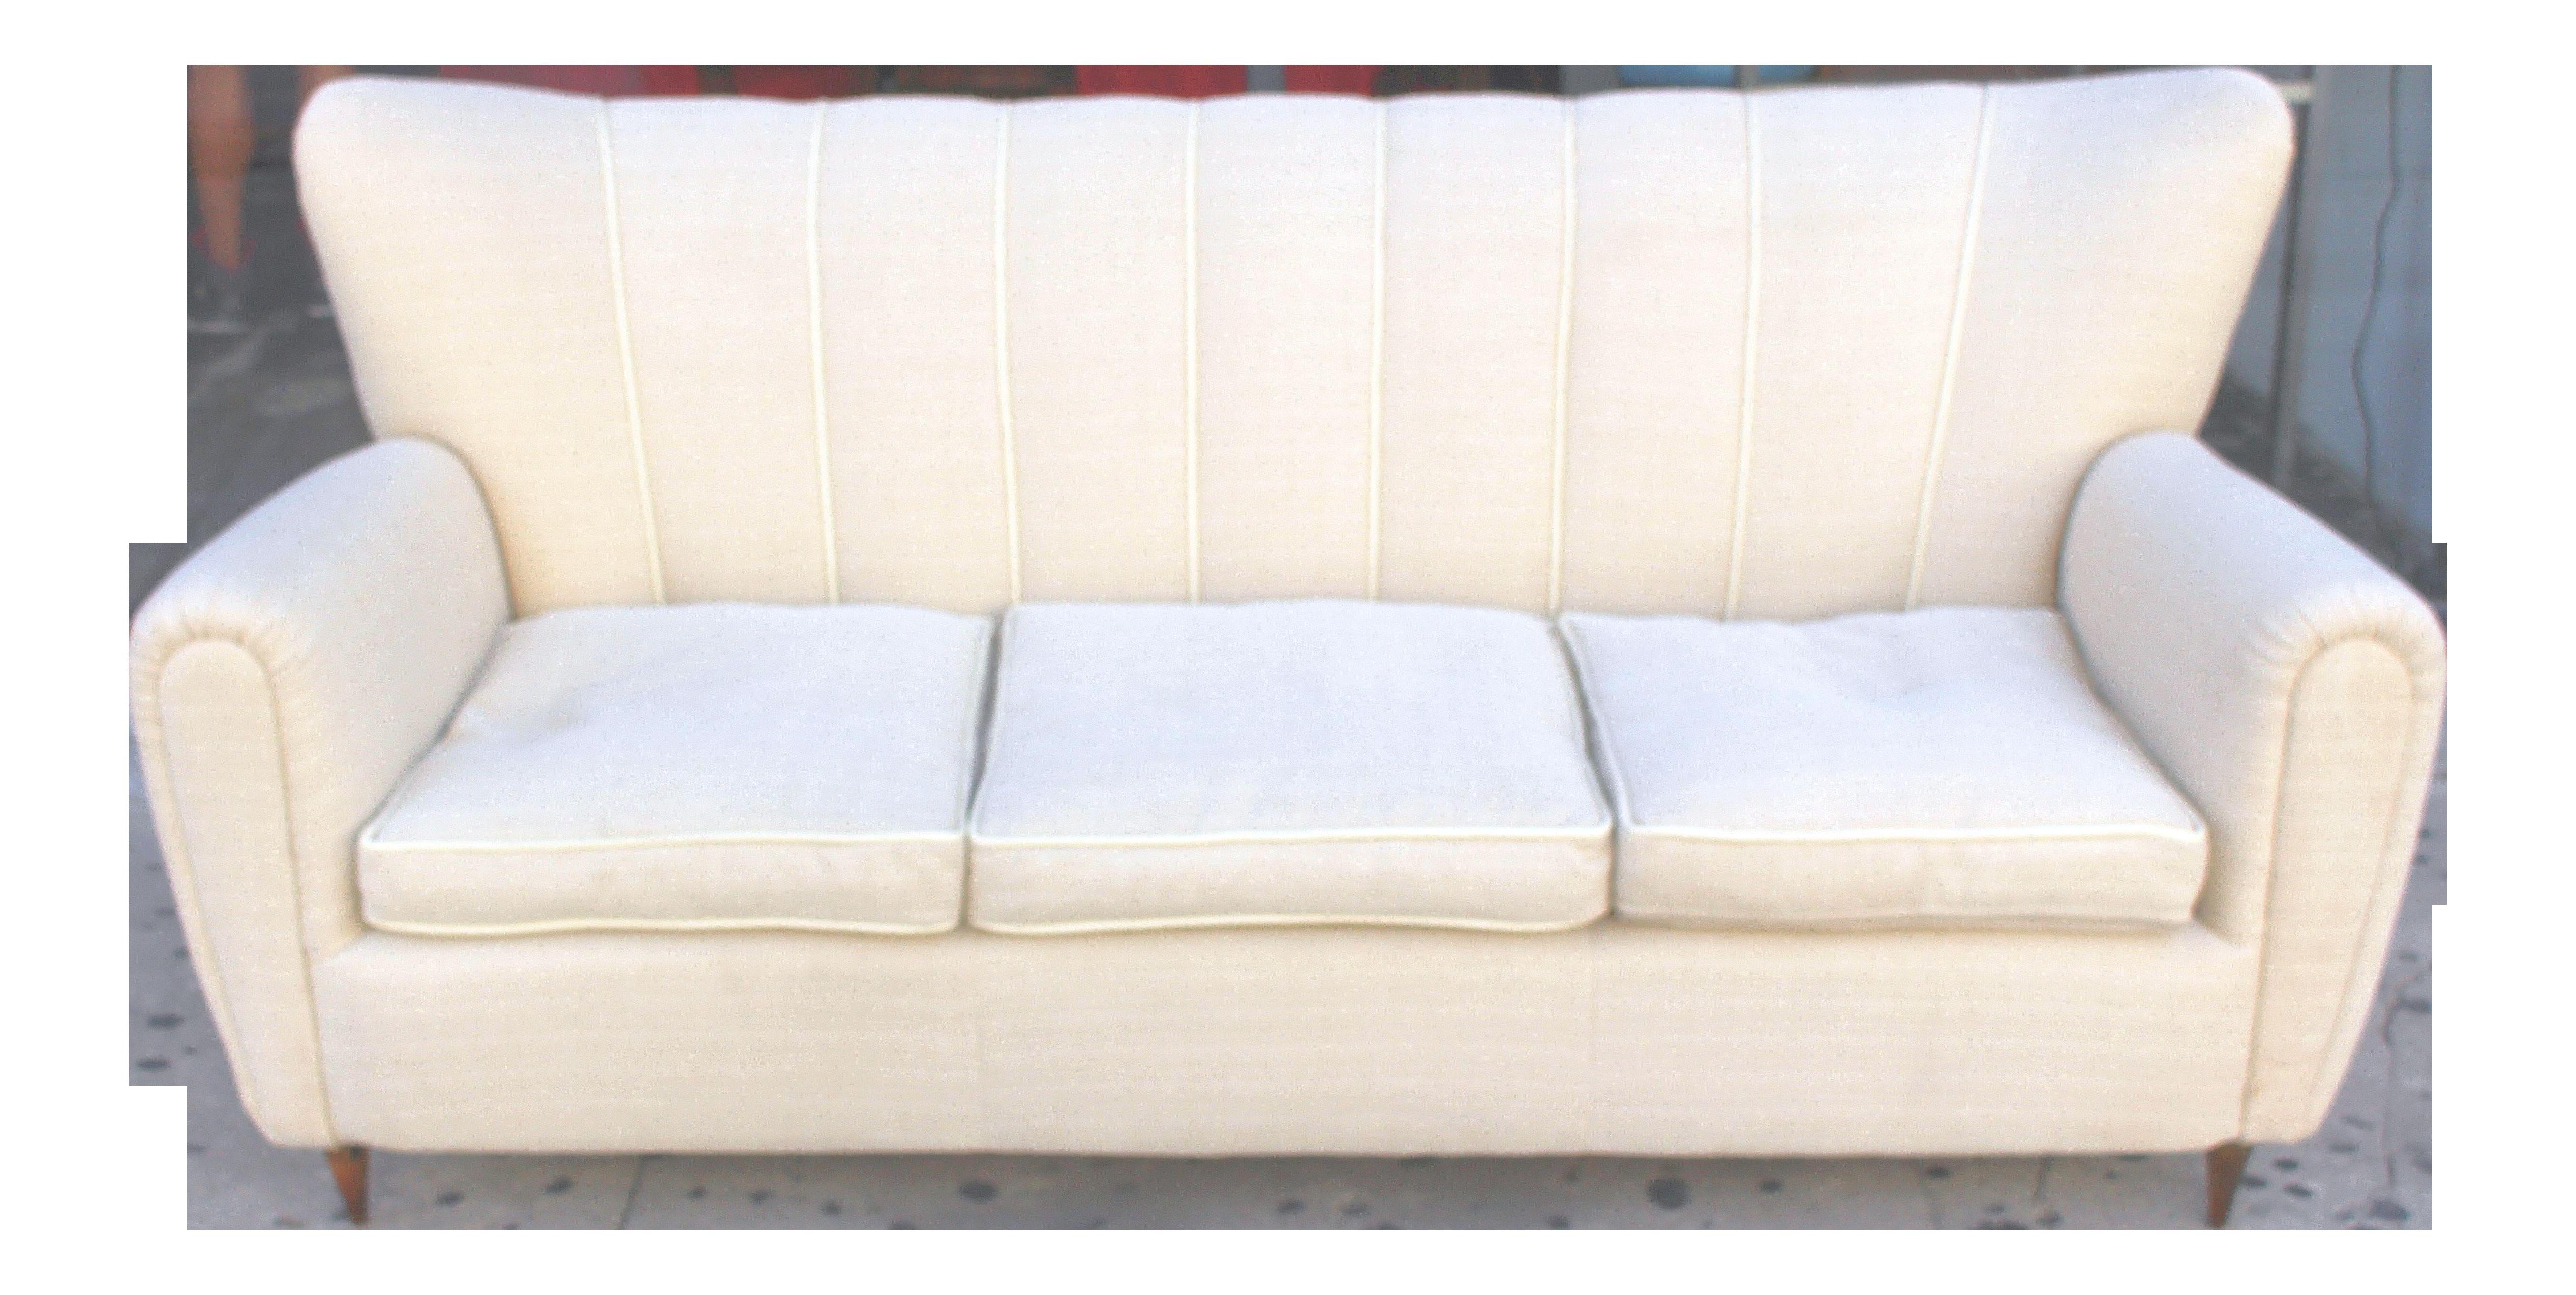 1950s Vintage Guglielmo Ulrich Style Italian Sofa | Chairish